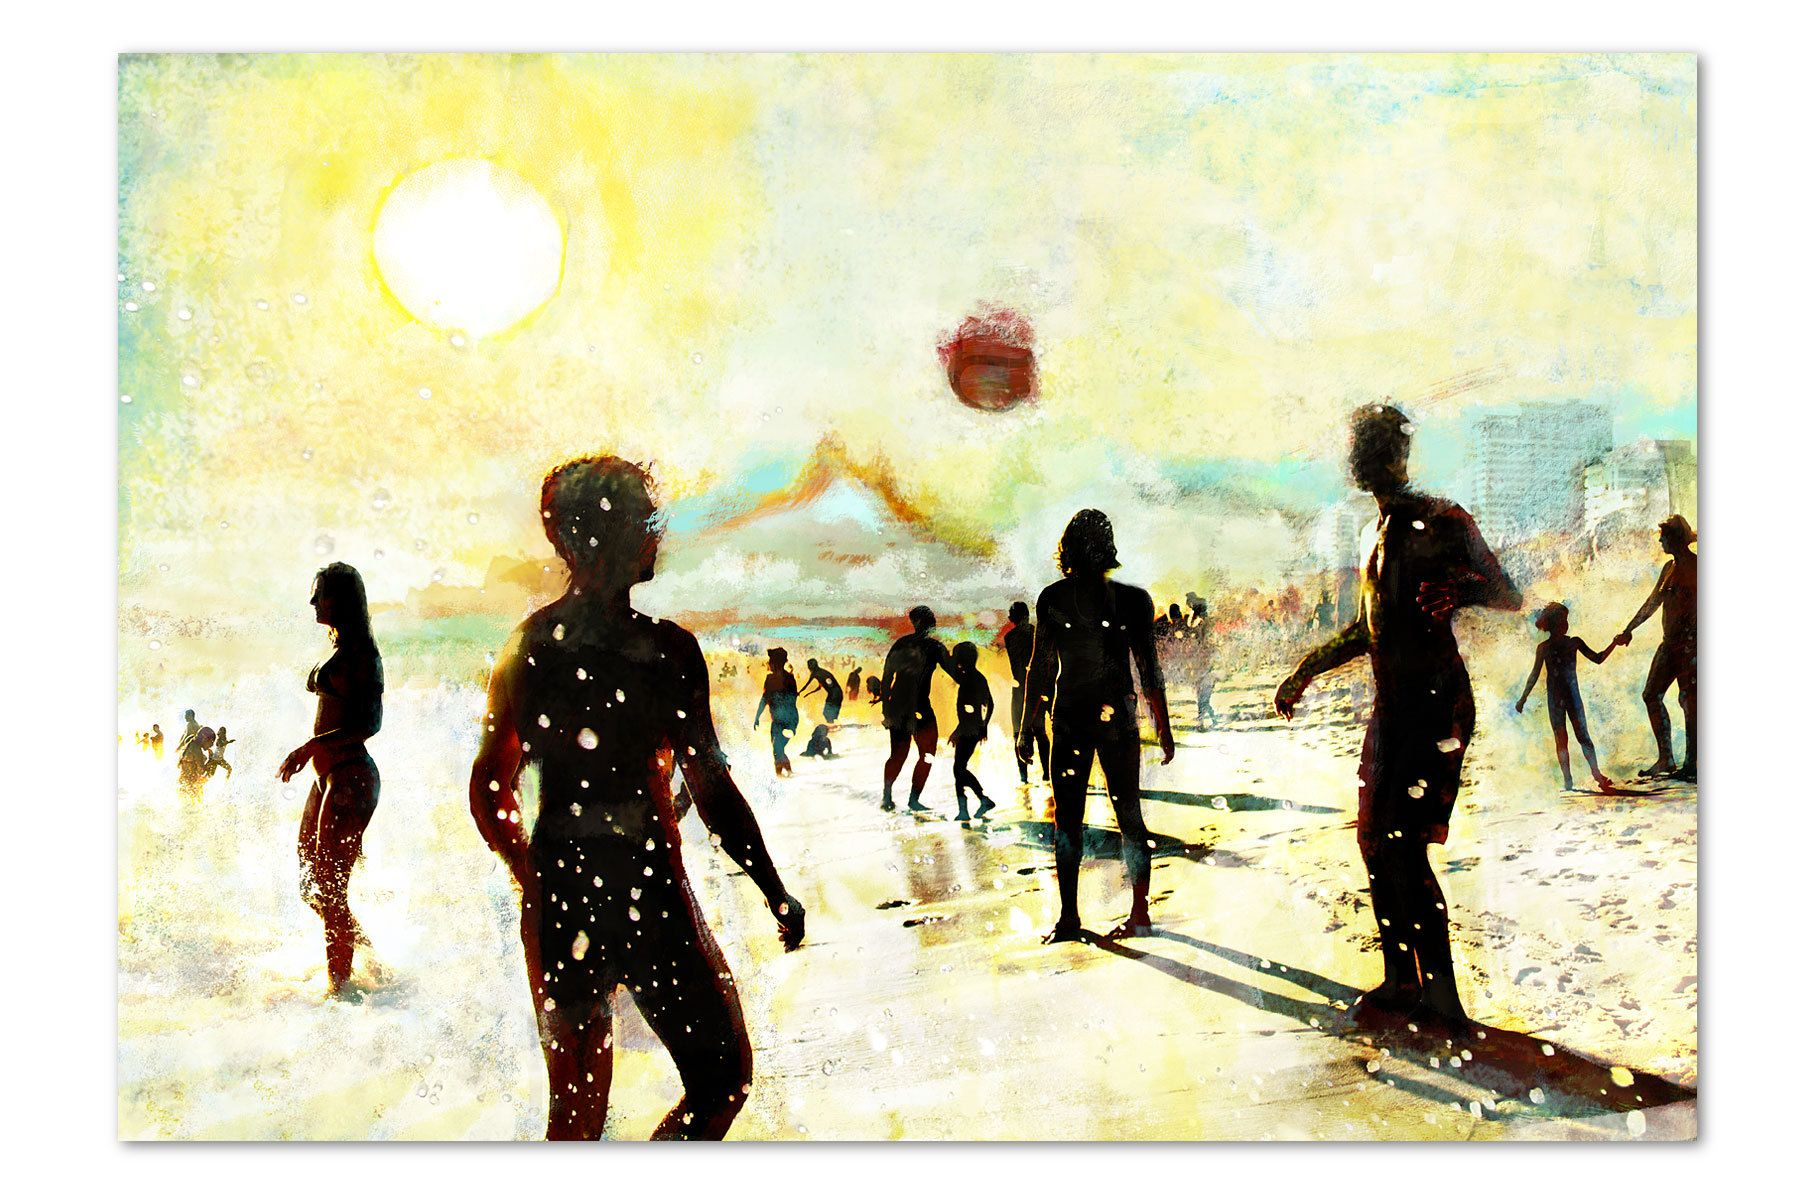 1brazil_beach_life_futebol_painting.jpg